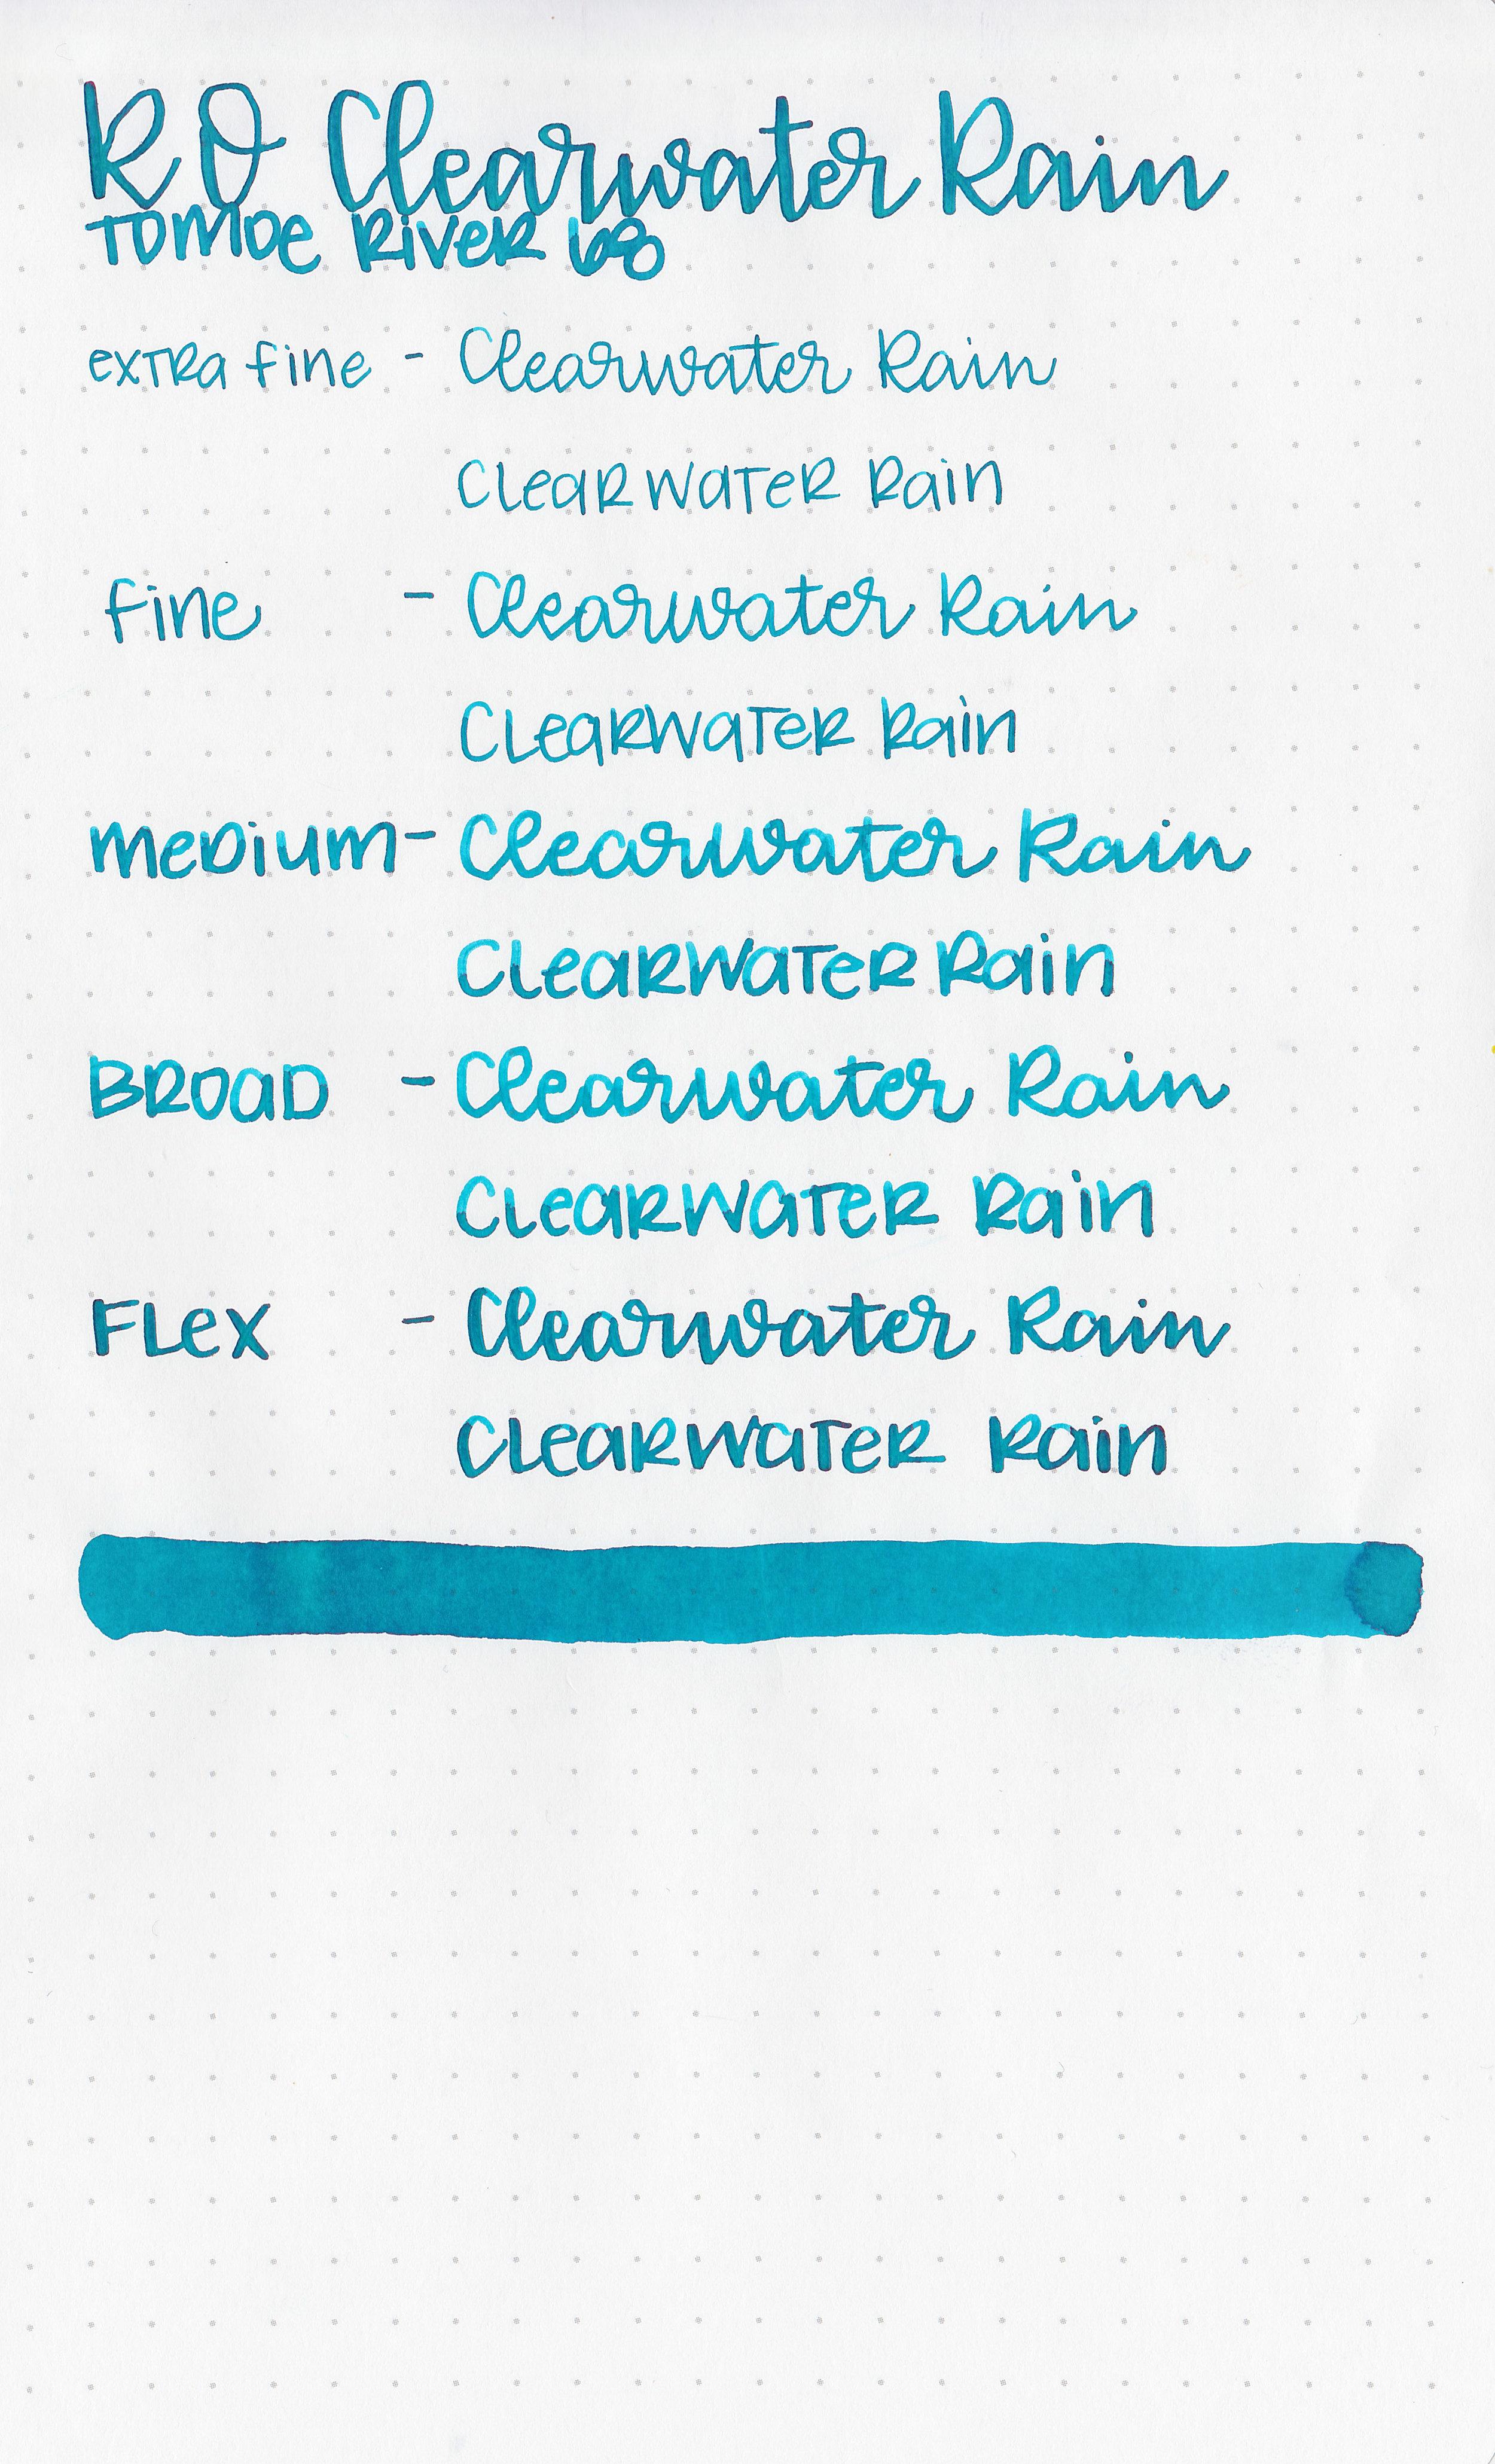 ro-clearwater-rain-10.jpg